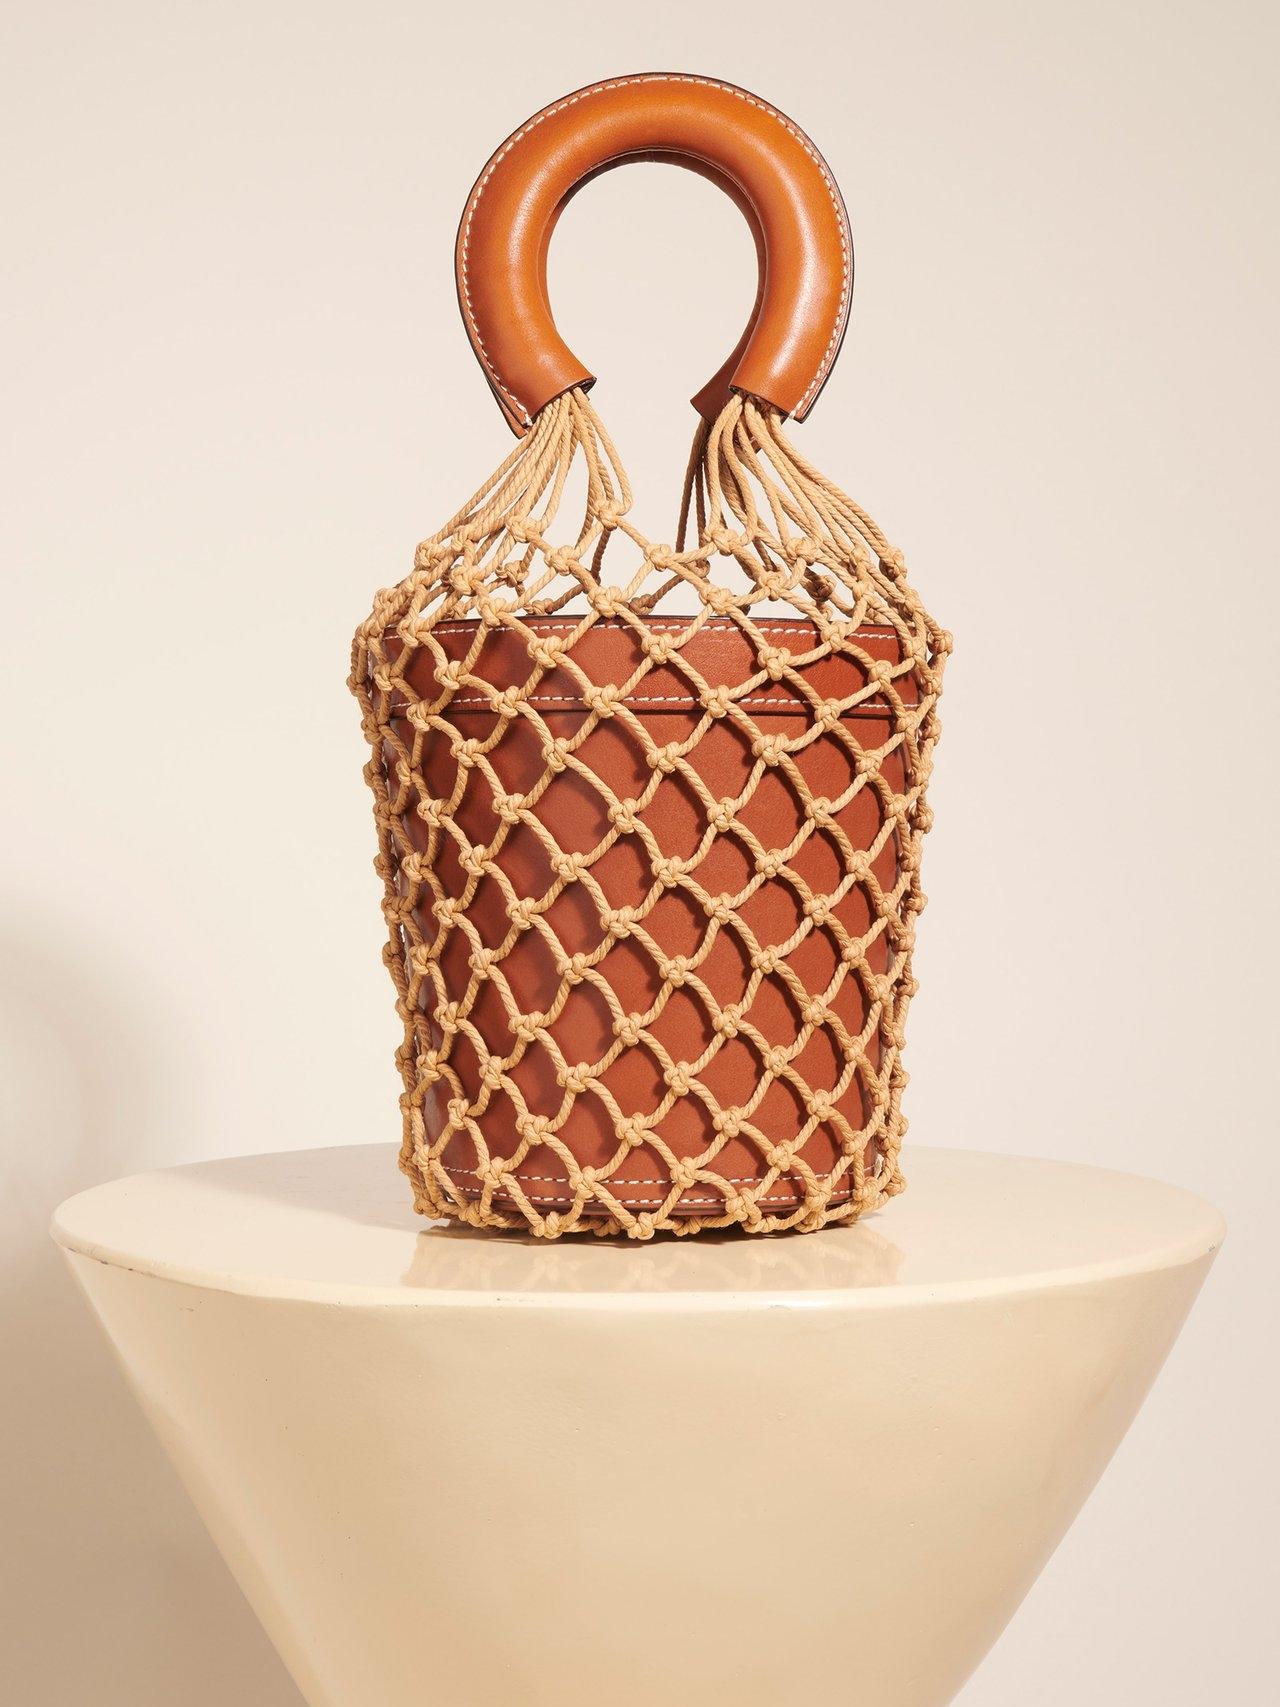 Moreau Bucket Bag in Saddle